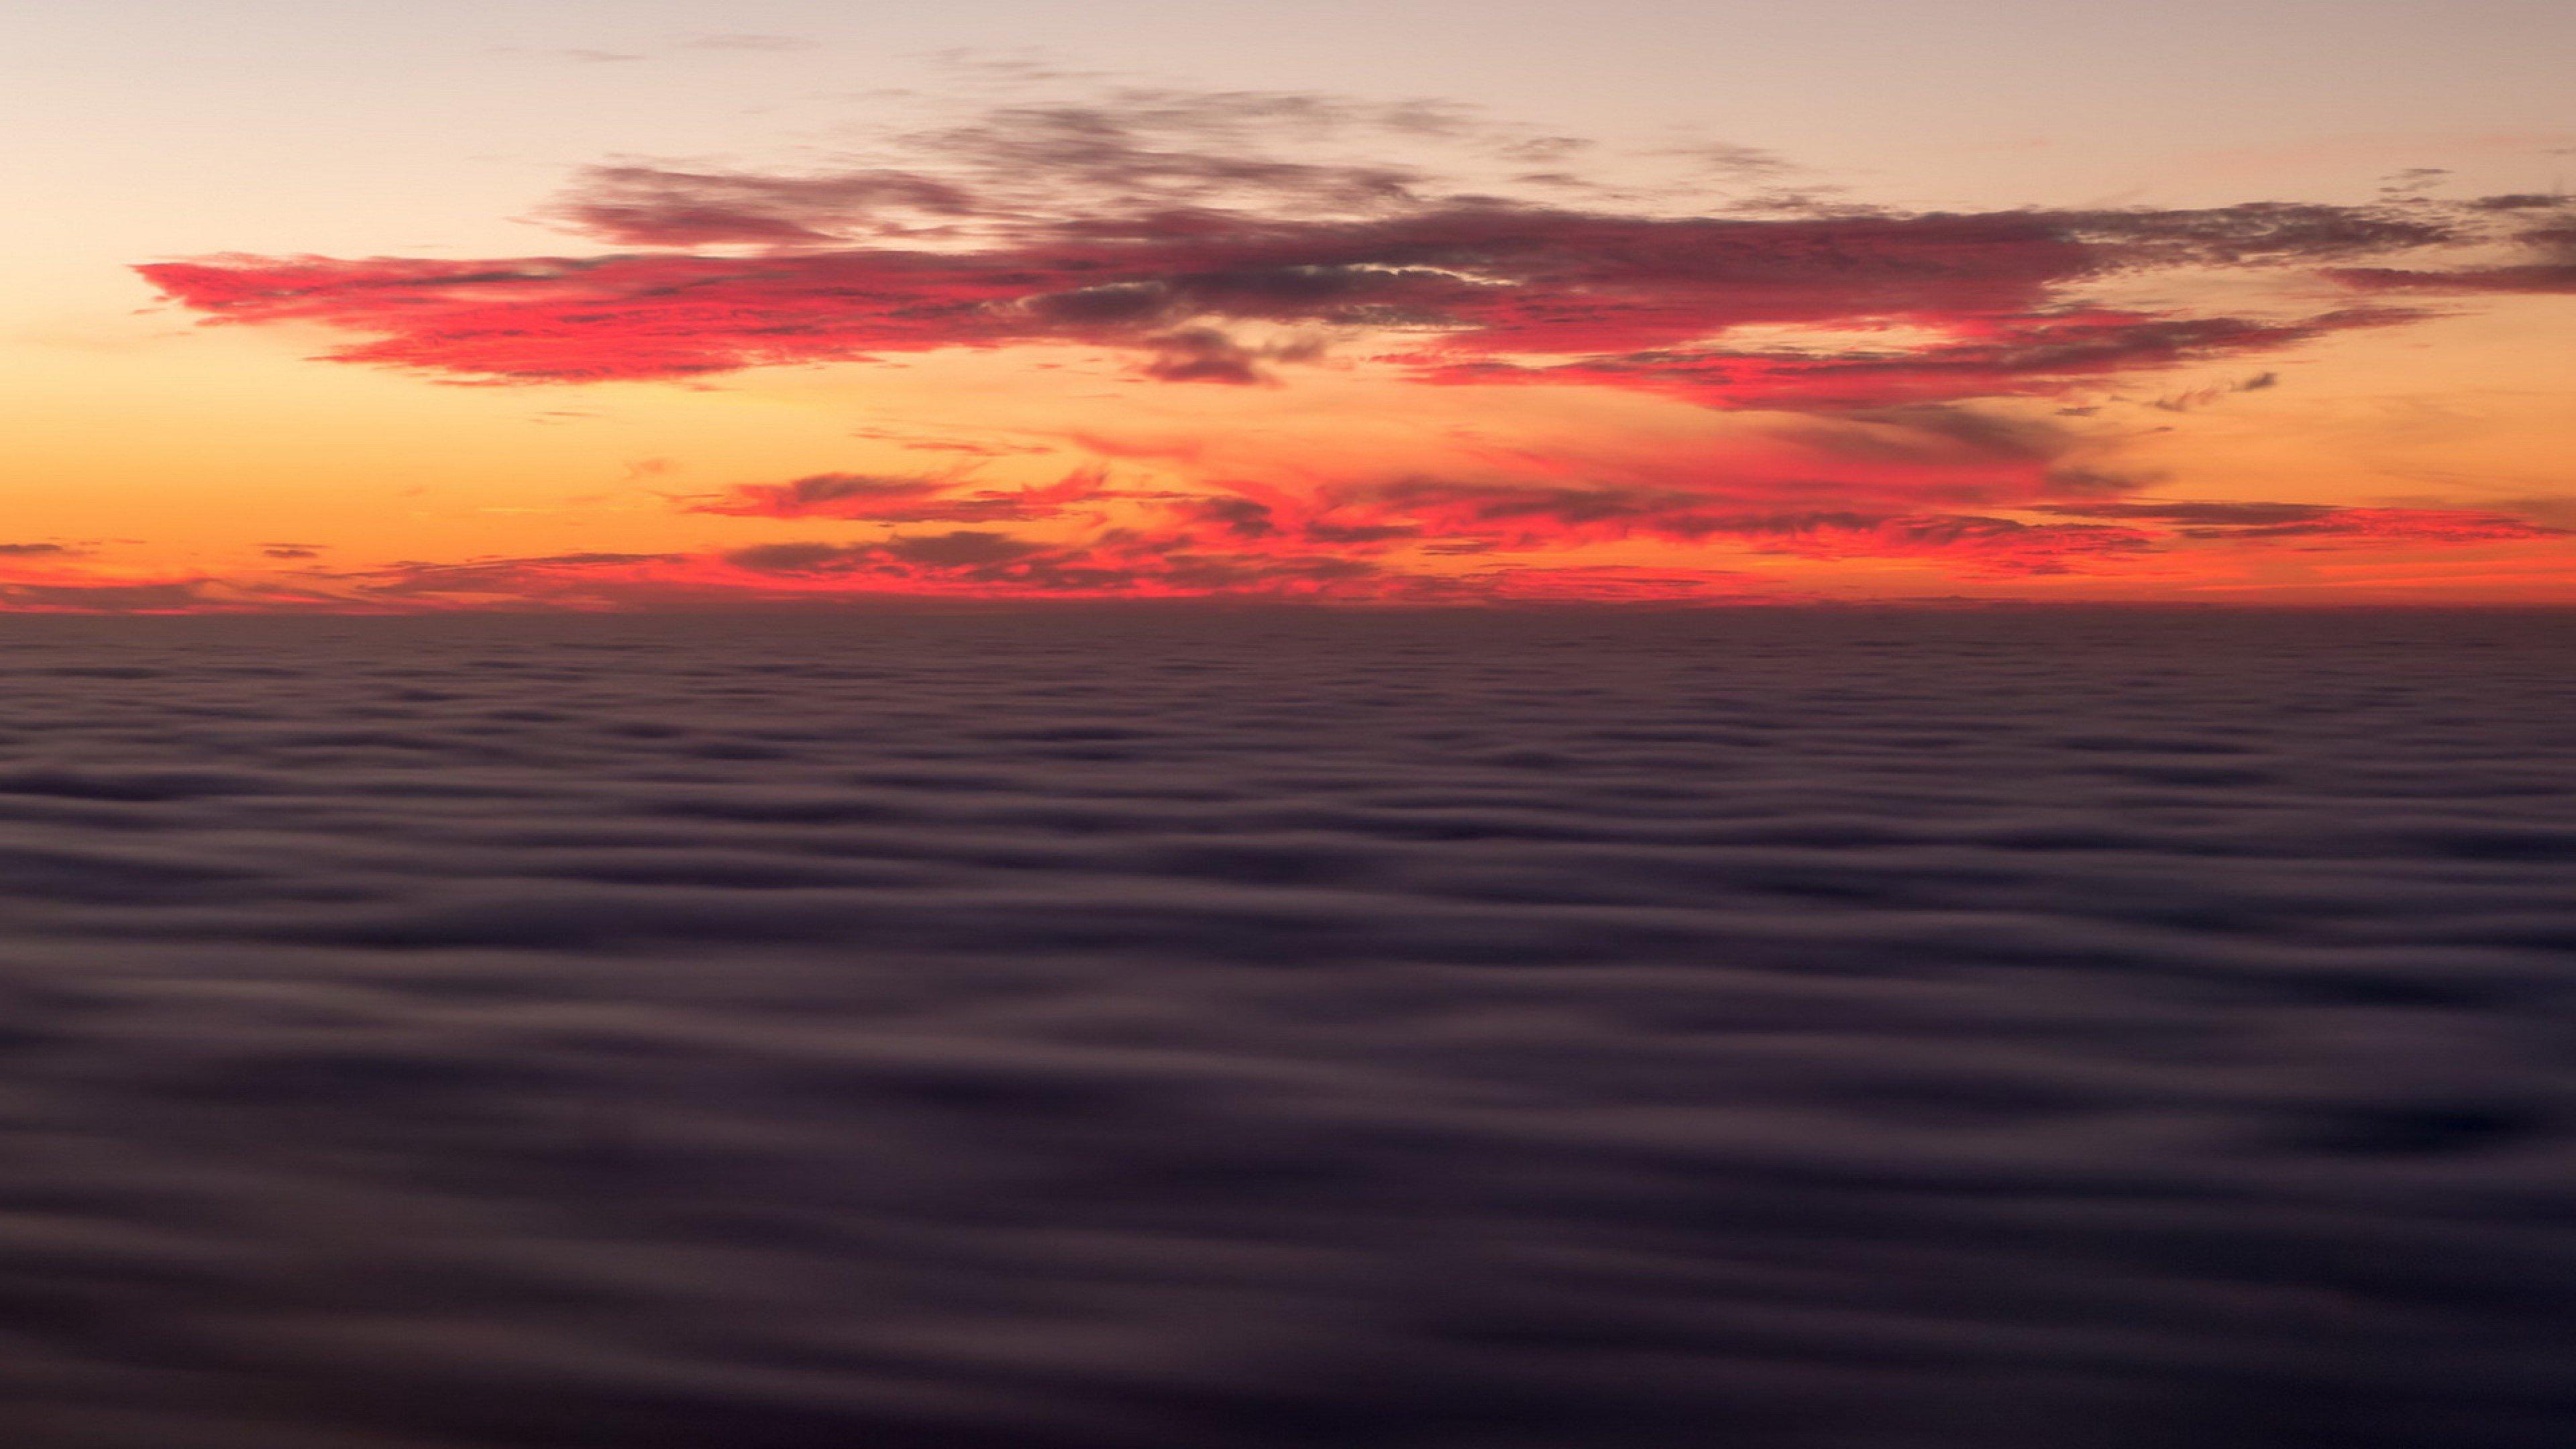 california sea sky horizon 4k 1540131530 - California Sea Sky Horizon 4k - sky wallpapers, sea wallpapers, nature wallpapers, horizon wallpapers, hd-wallpapers, california wallpapers